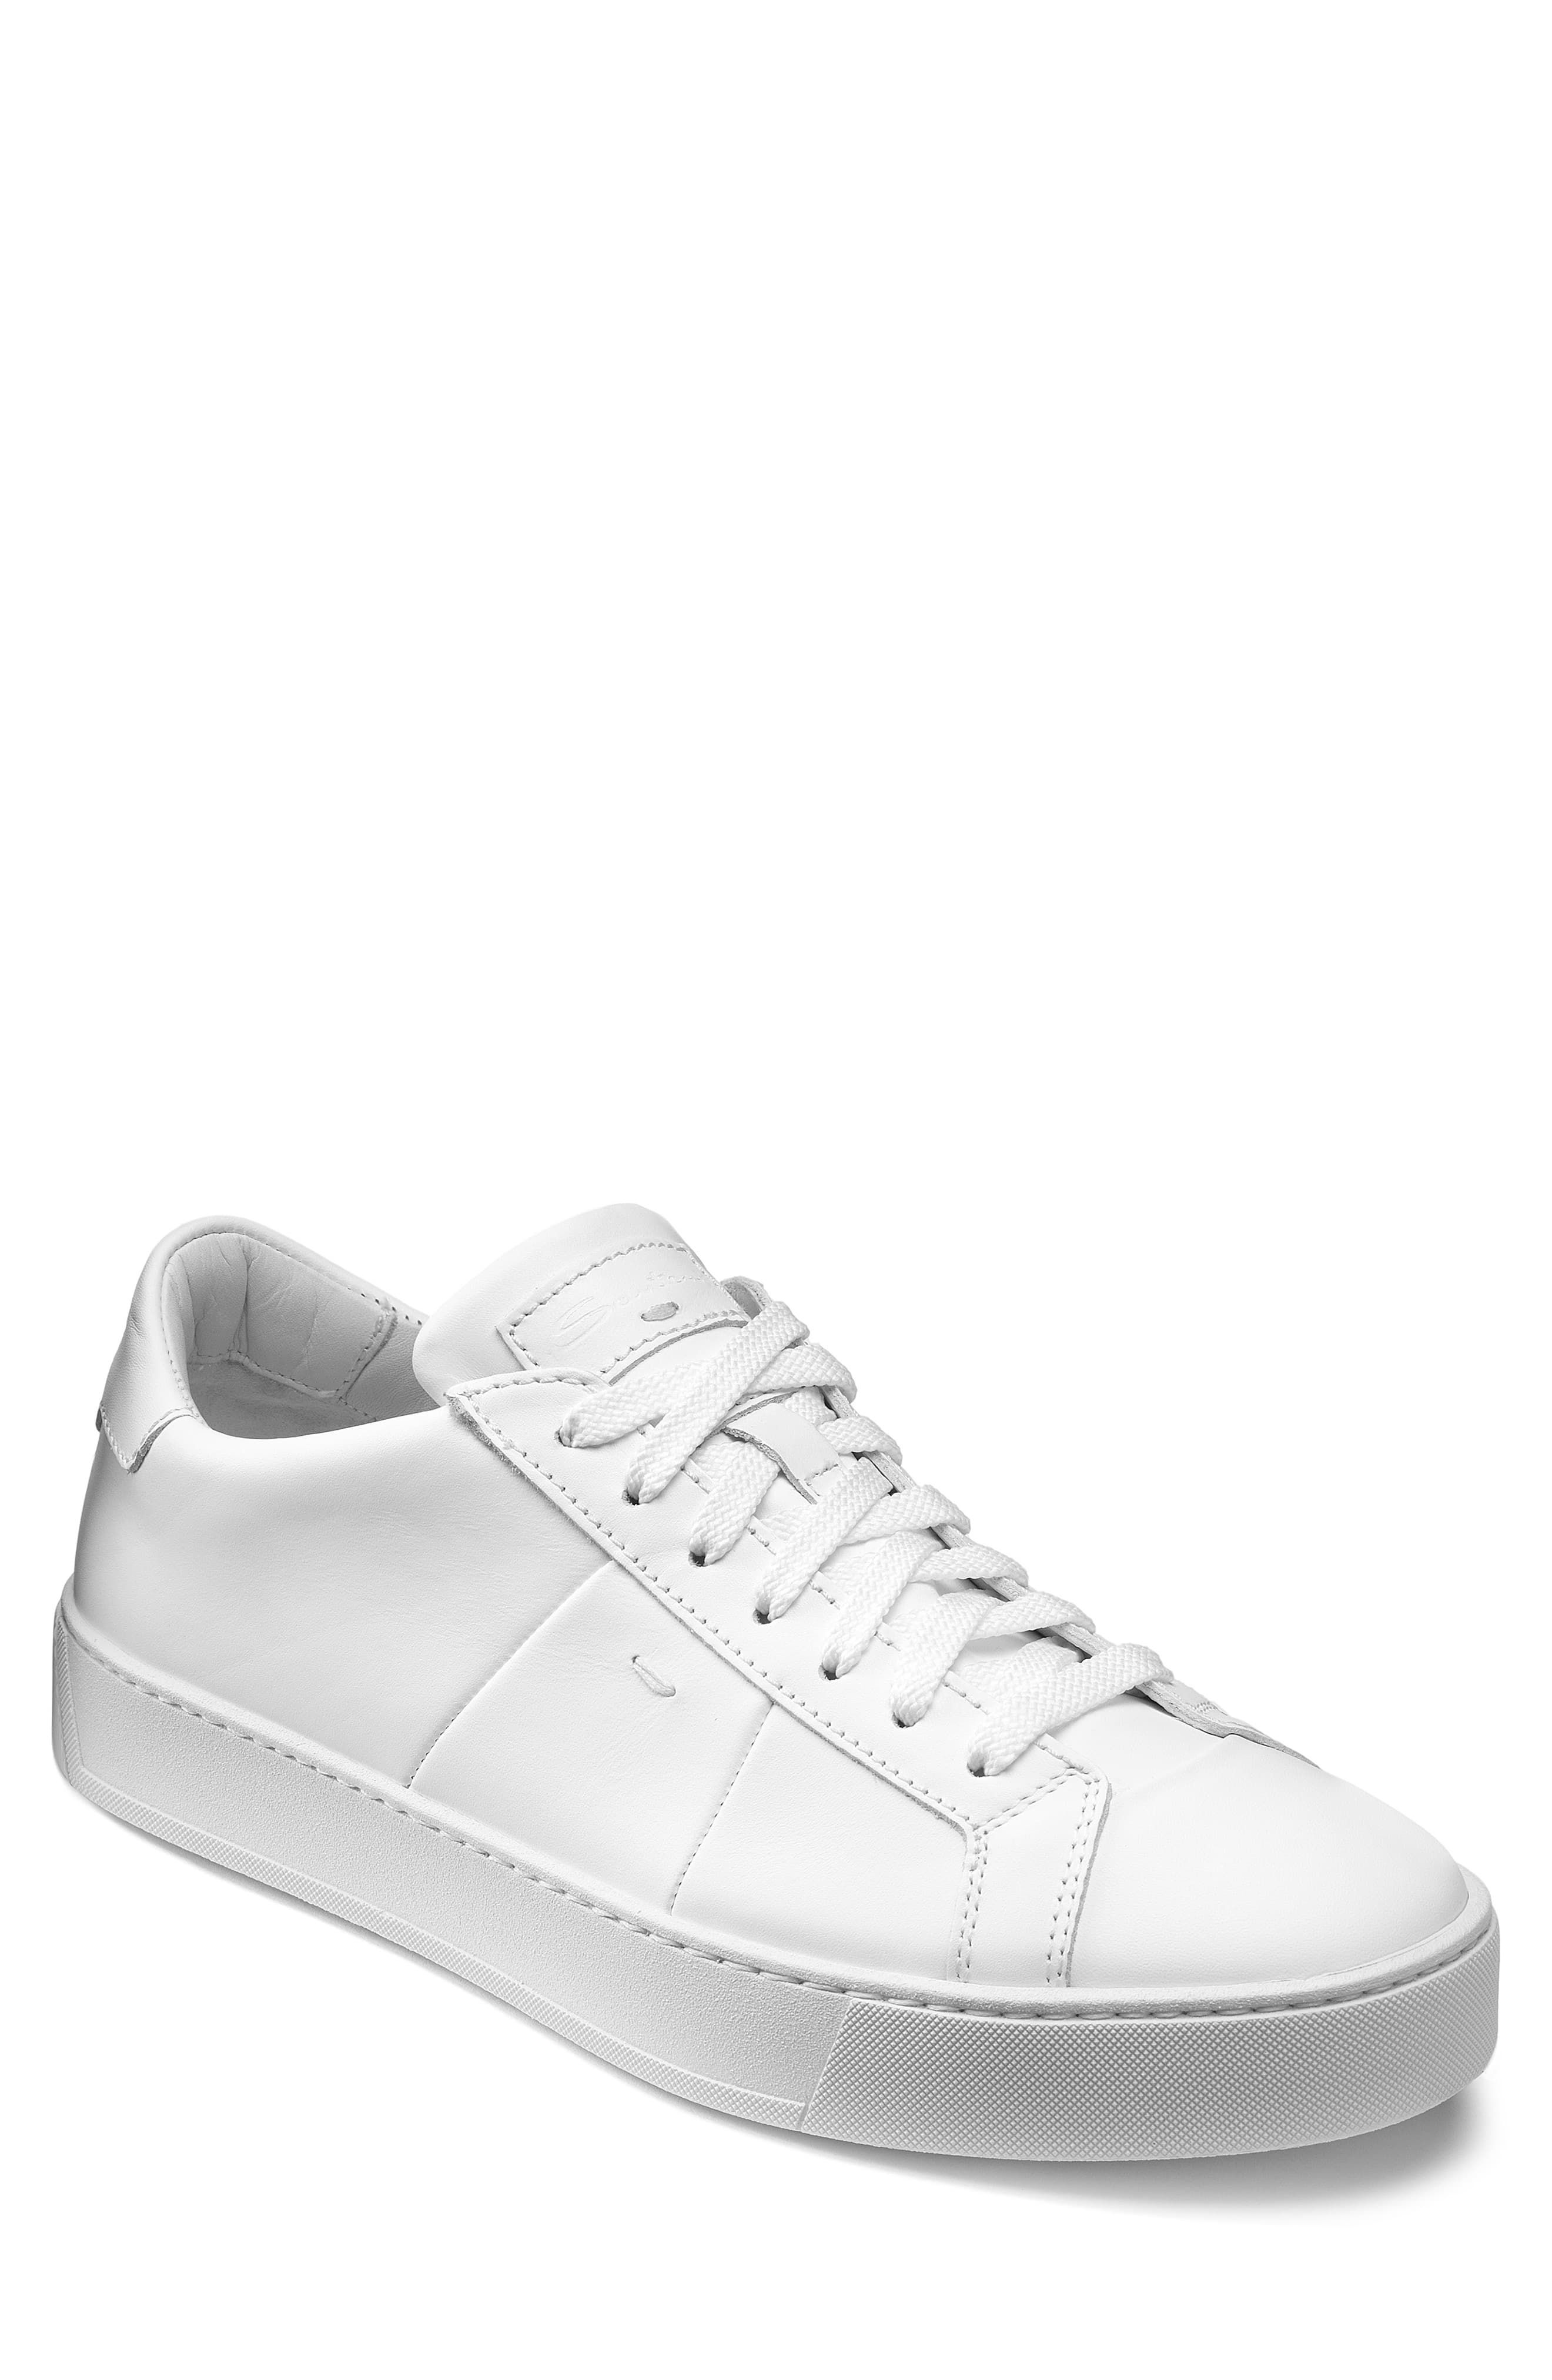 Men's Santoni Gloria Sneaker, Size 8.5